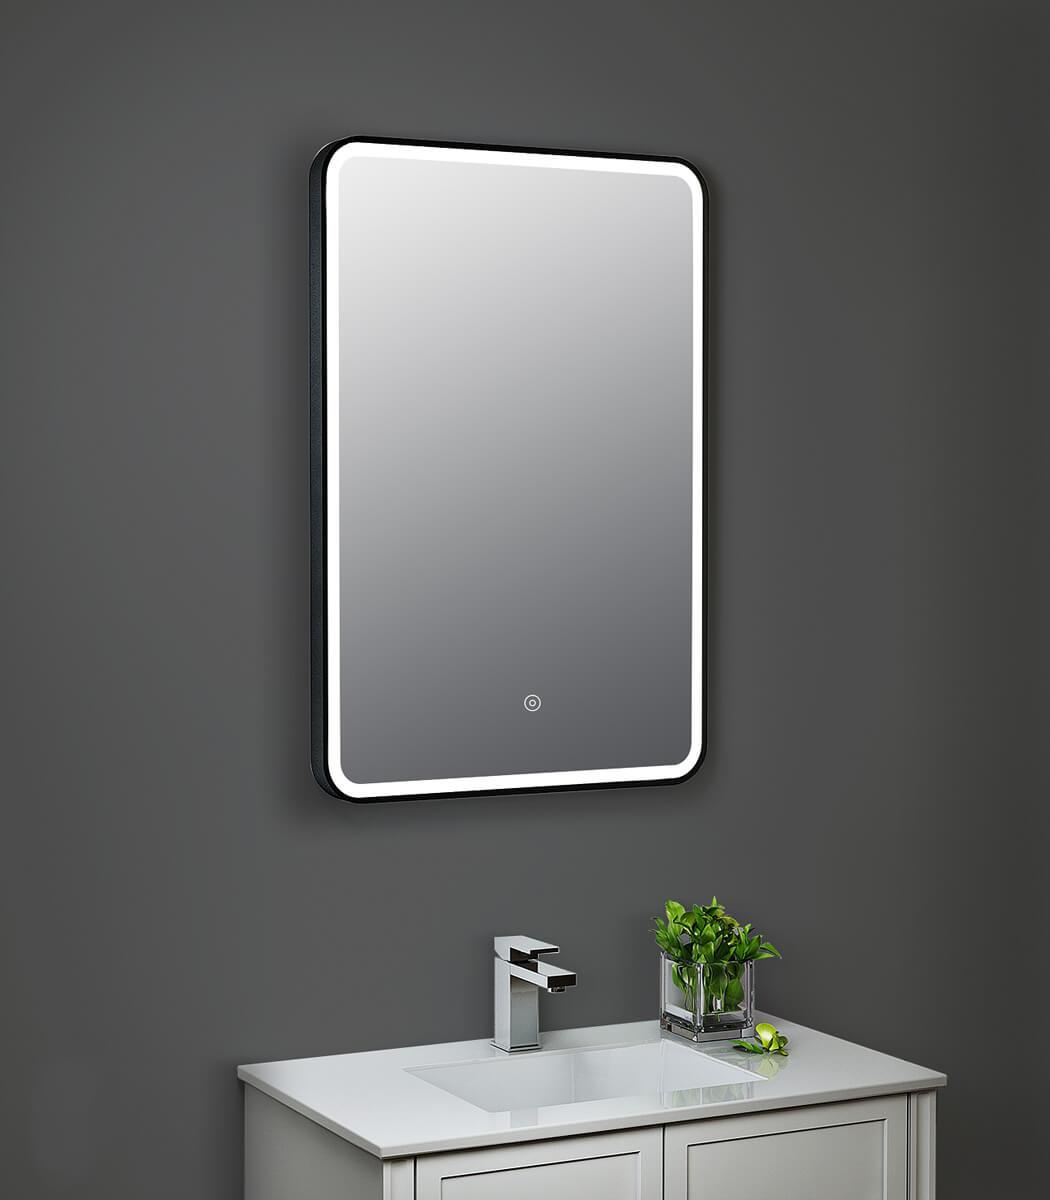 Hudson Reed 500 X 700mm Black Framed Led Illuminated Touch Sensor Mirror